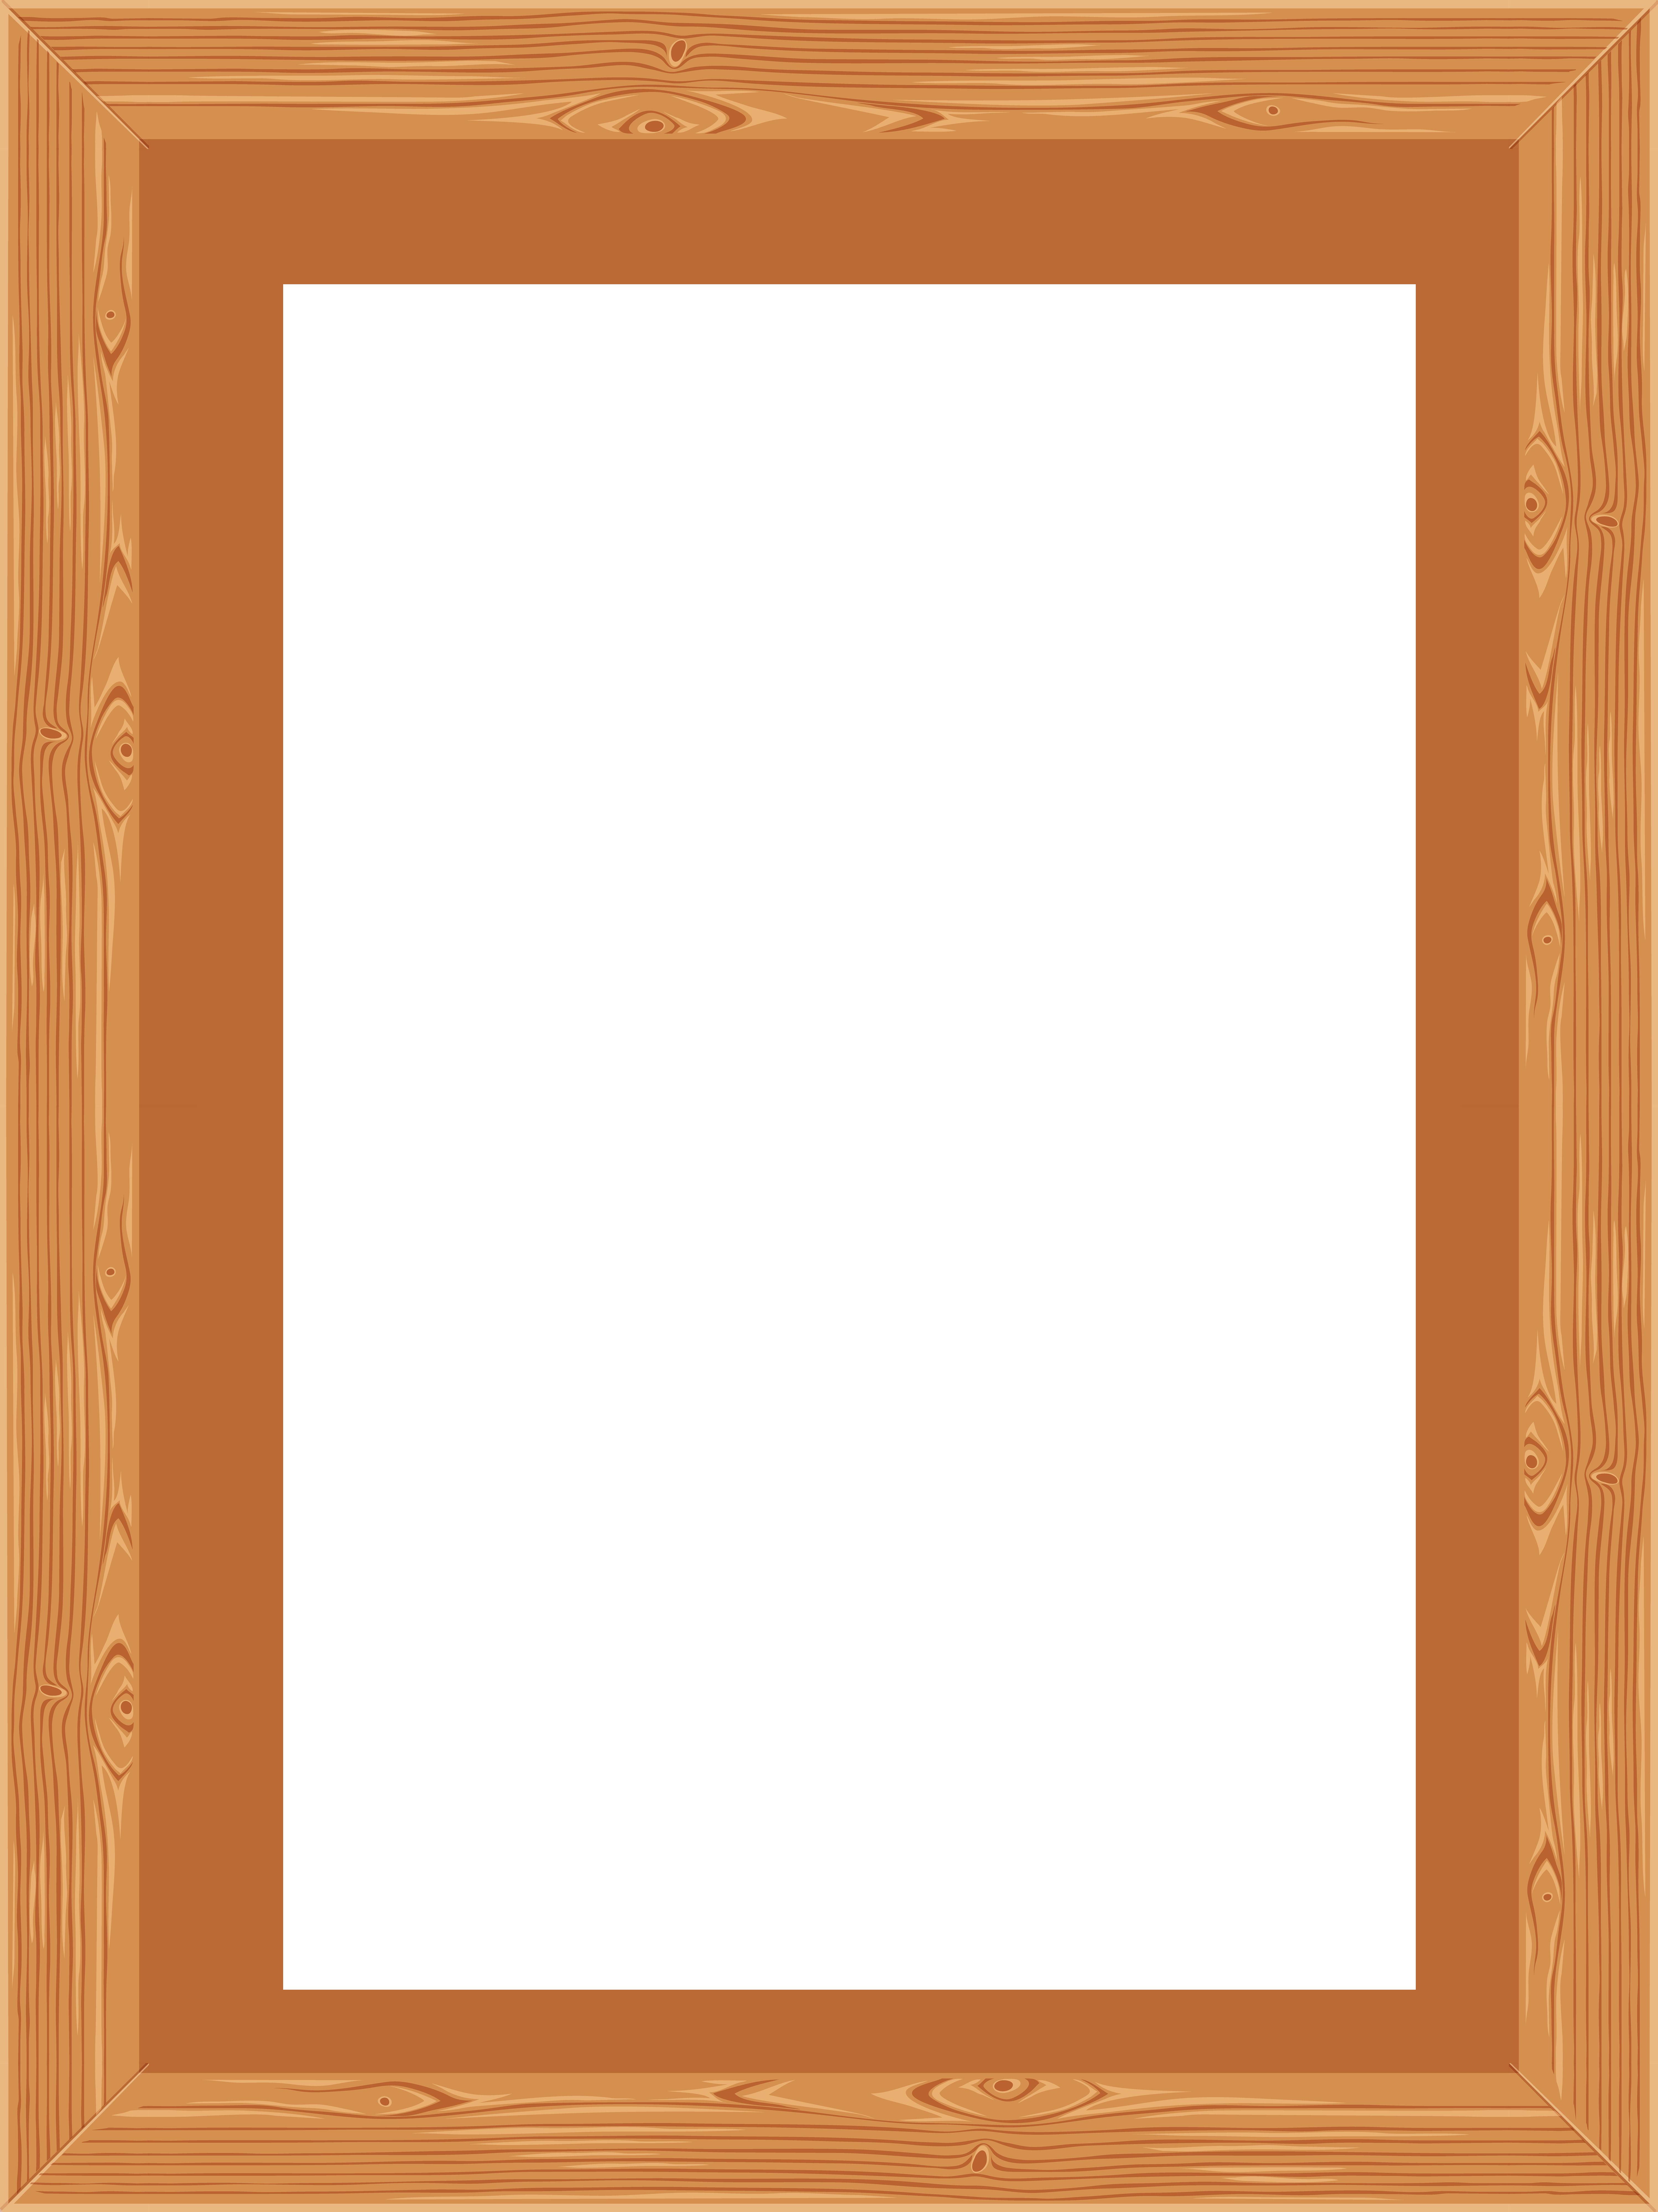 Wood border png. Transparent classic wooden frame